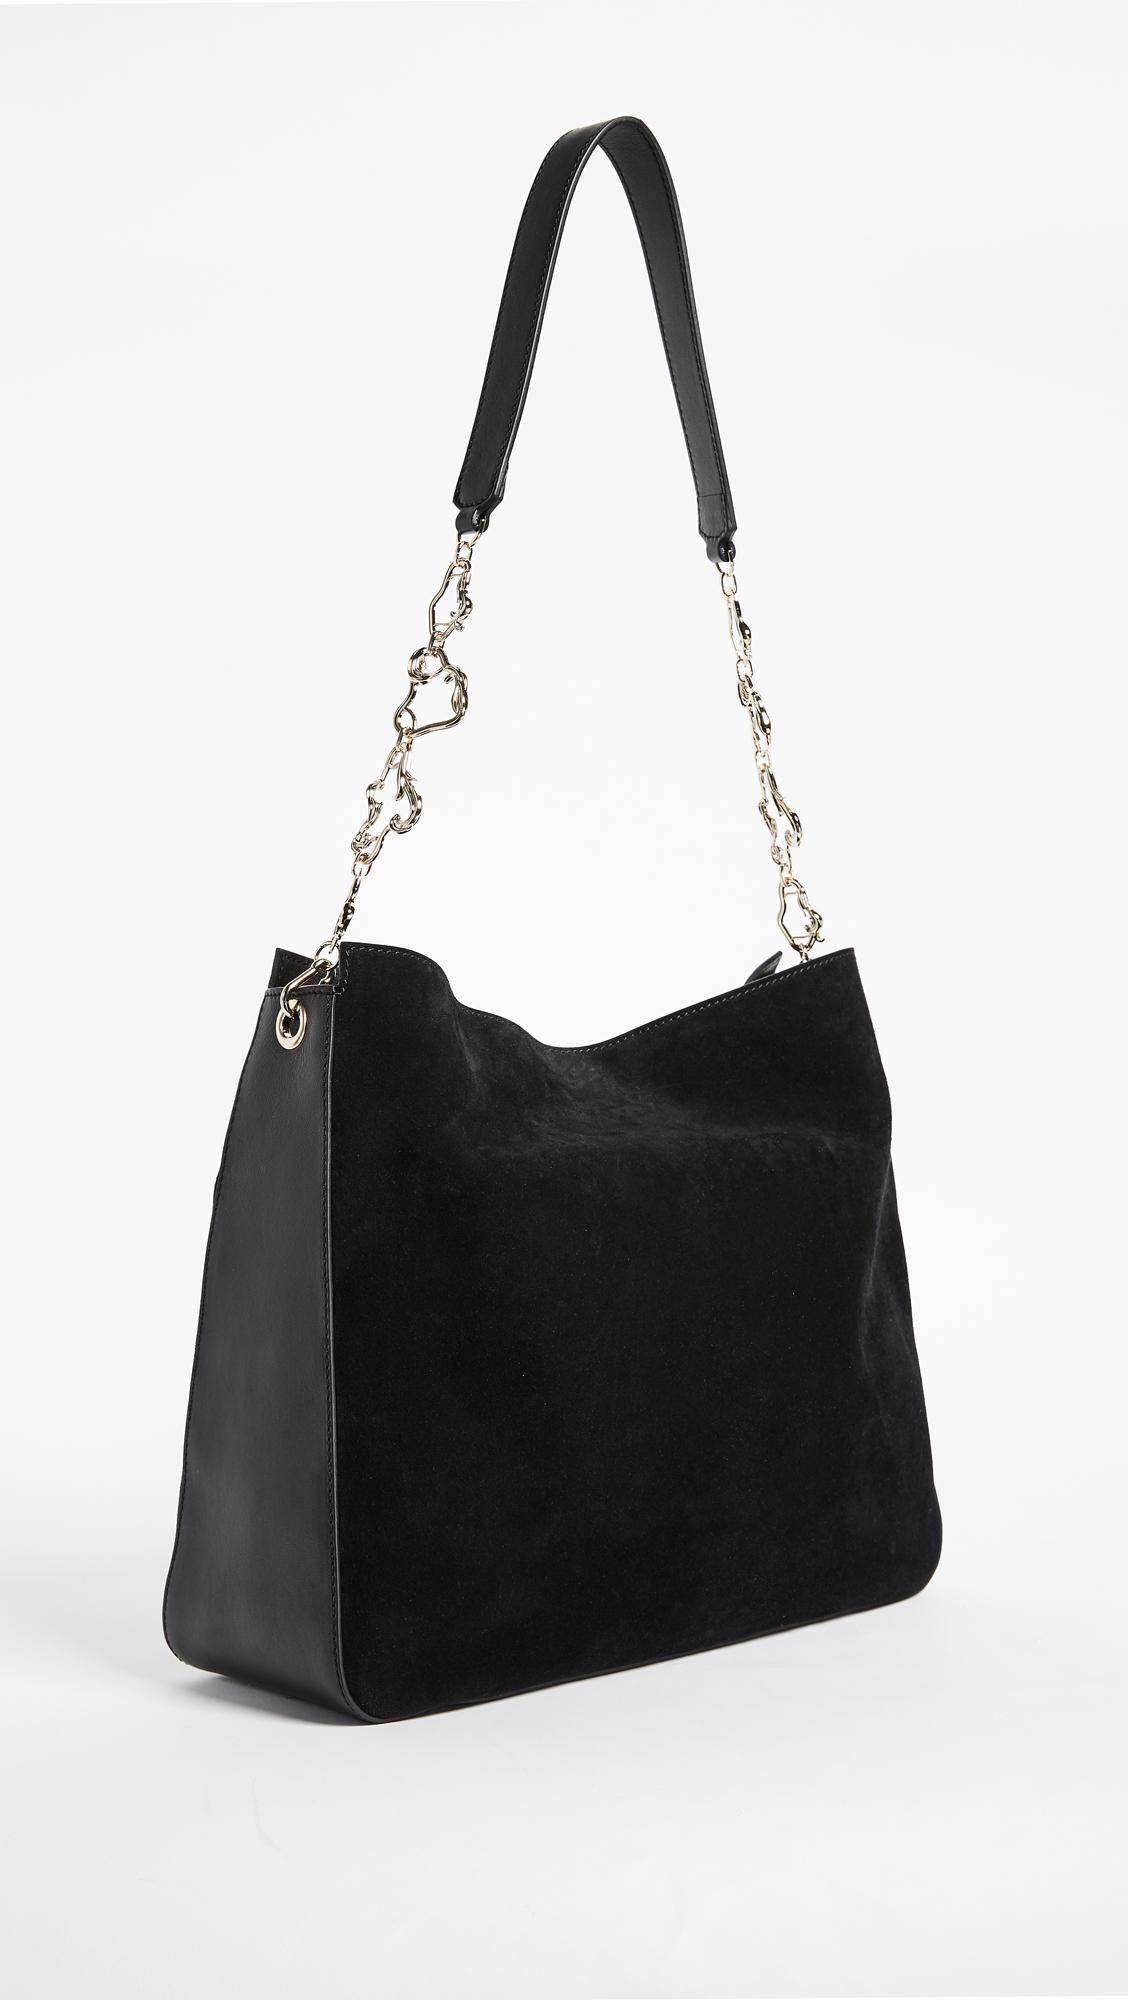 6d7eae1a916c Lyst - Versace Medium Shoulder Bag in Black